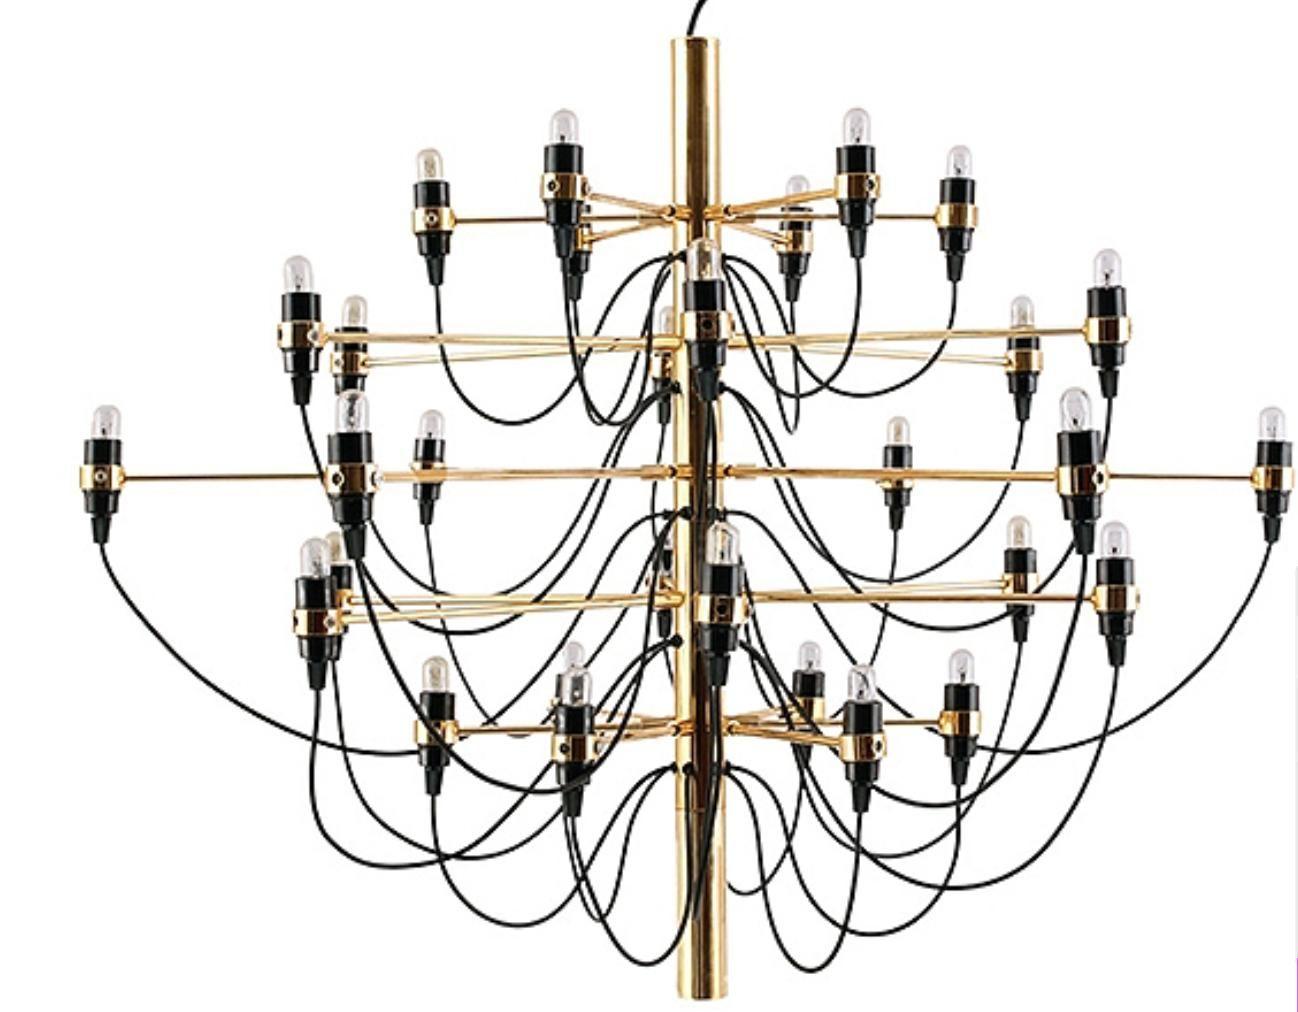 Chandelier Gold 50 Ampoules Inspiré Design Gino Sarfatti Lestens Fr